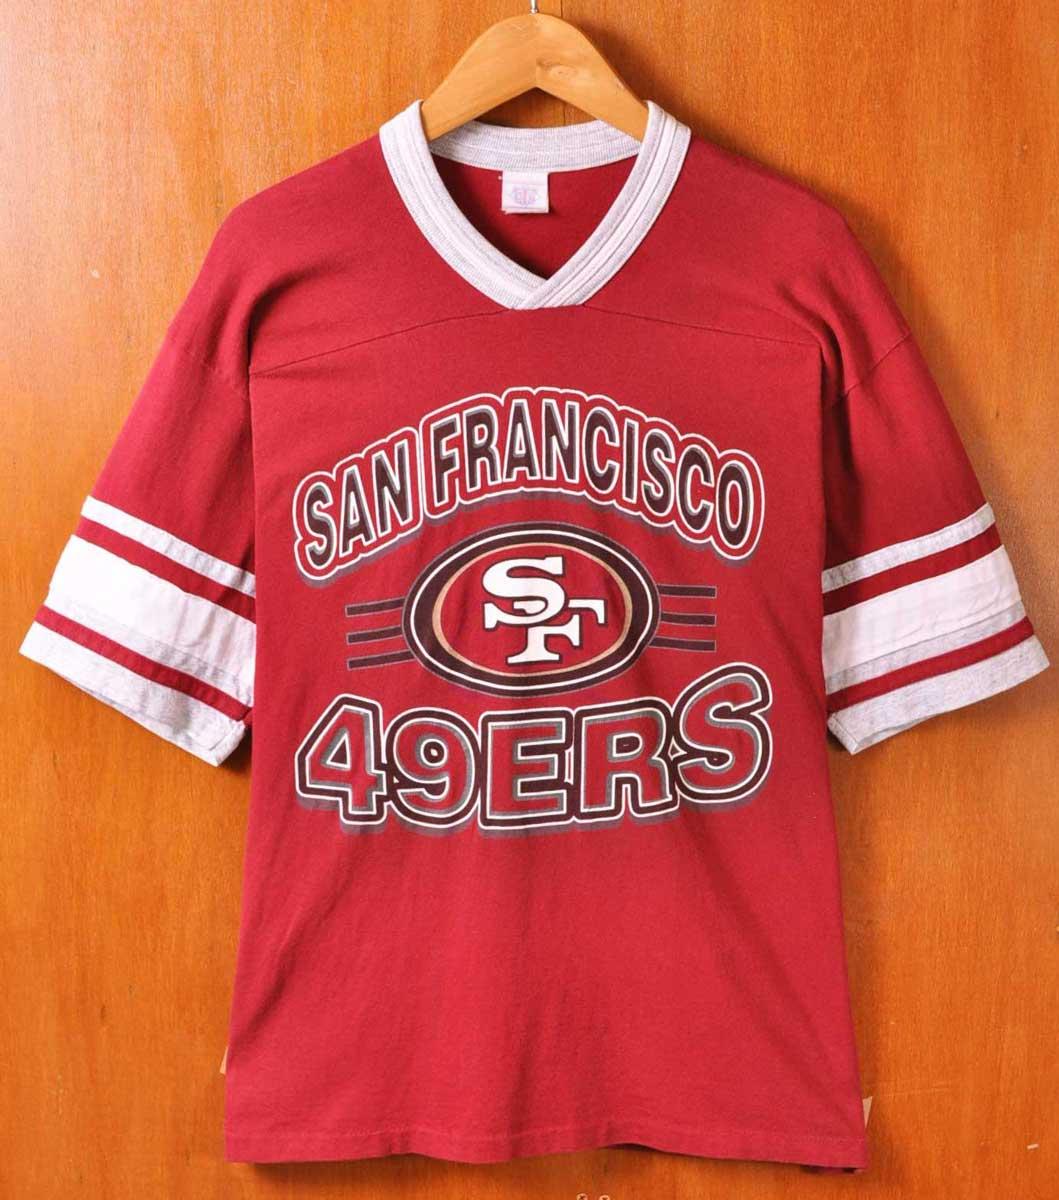 premium selection 19af5 bacbc San Francisco 49ers T Shirts Cheap | Azərbaycan Dillər ...